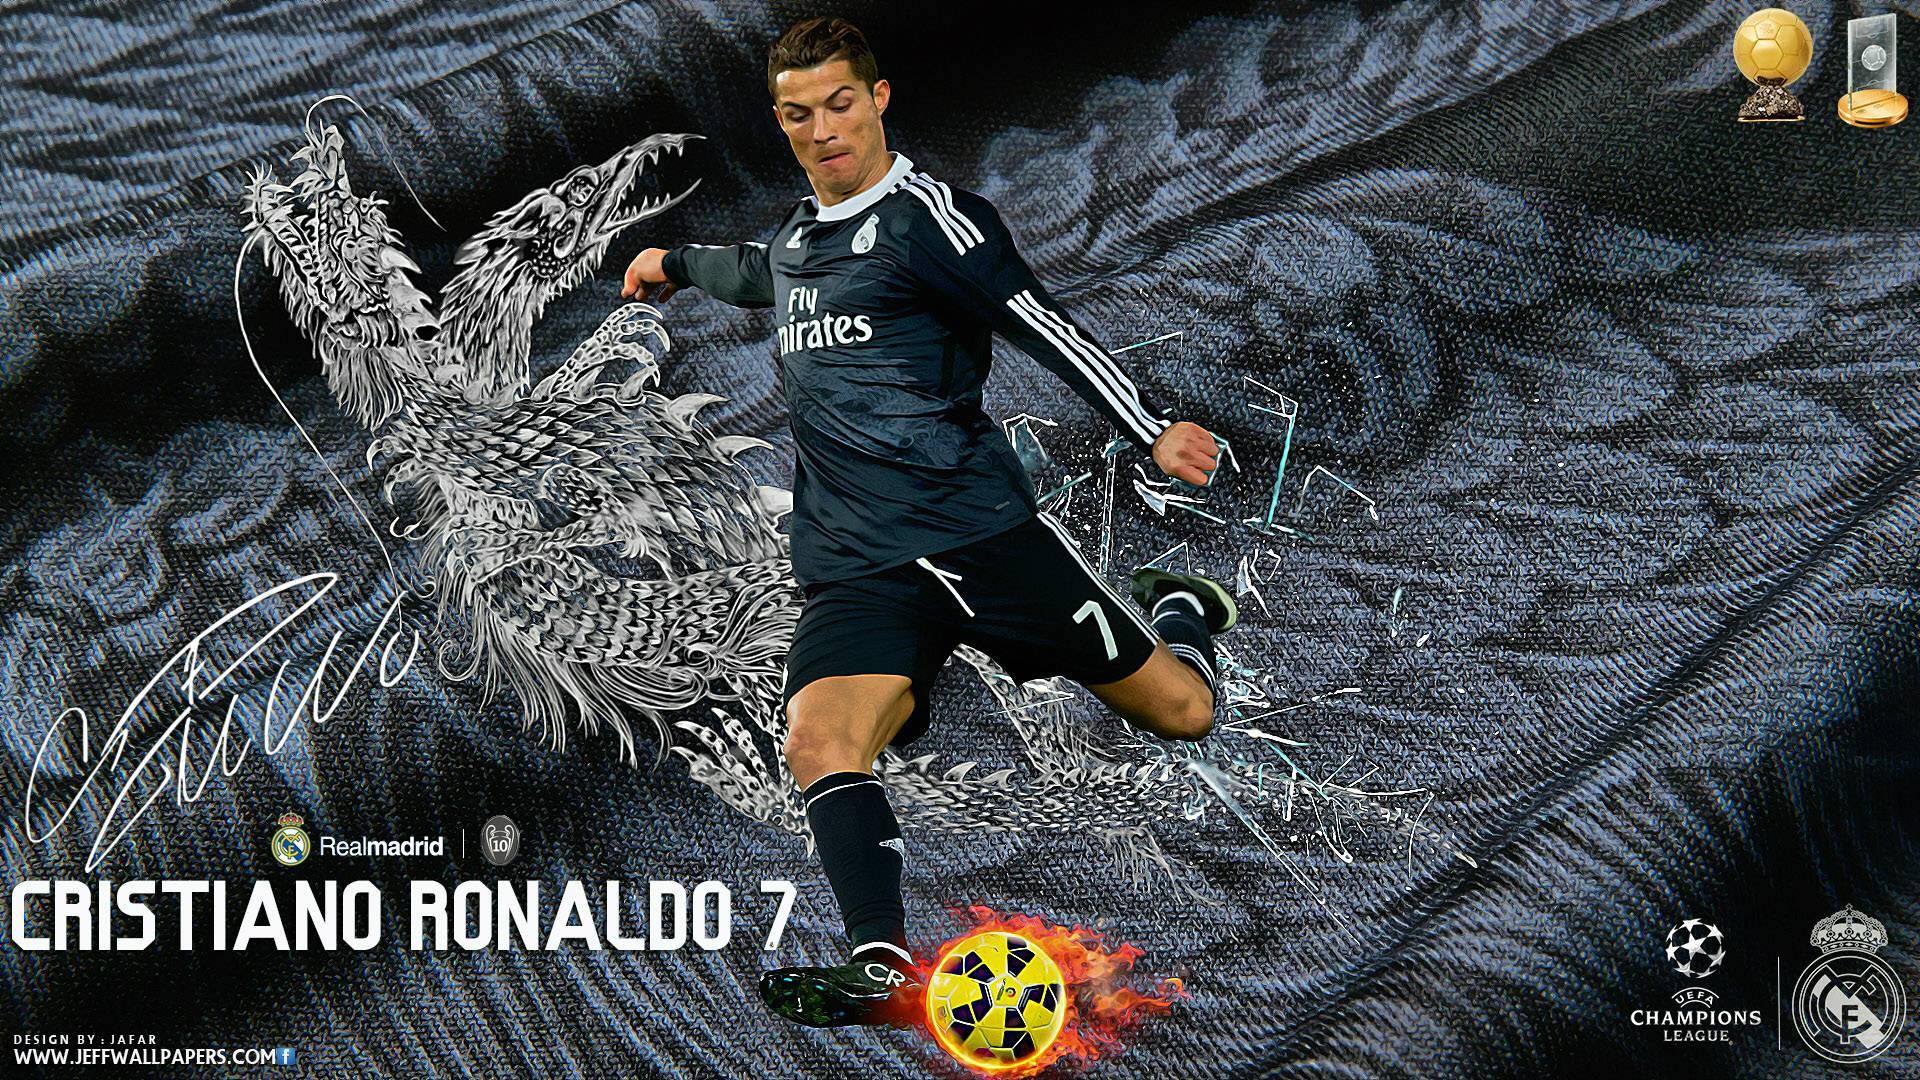 Cristiano Ronaldo Wallpapers 2015 Nike 1920x1080